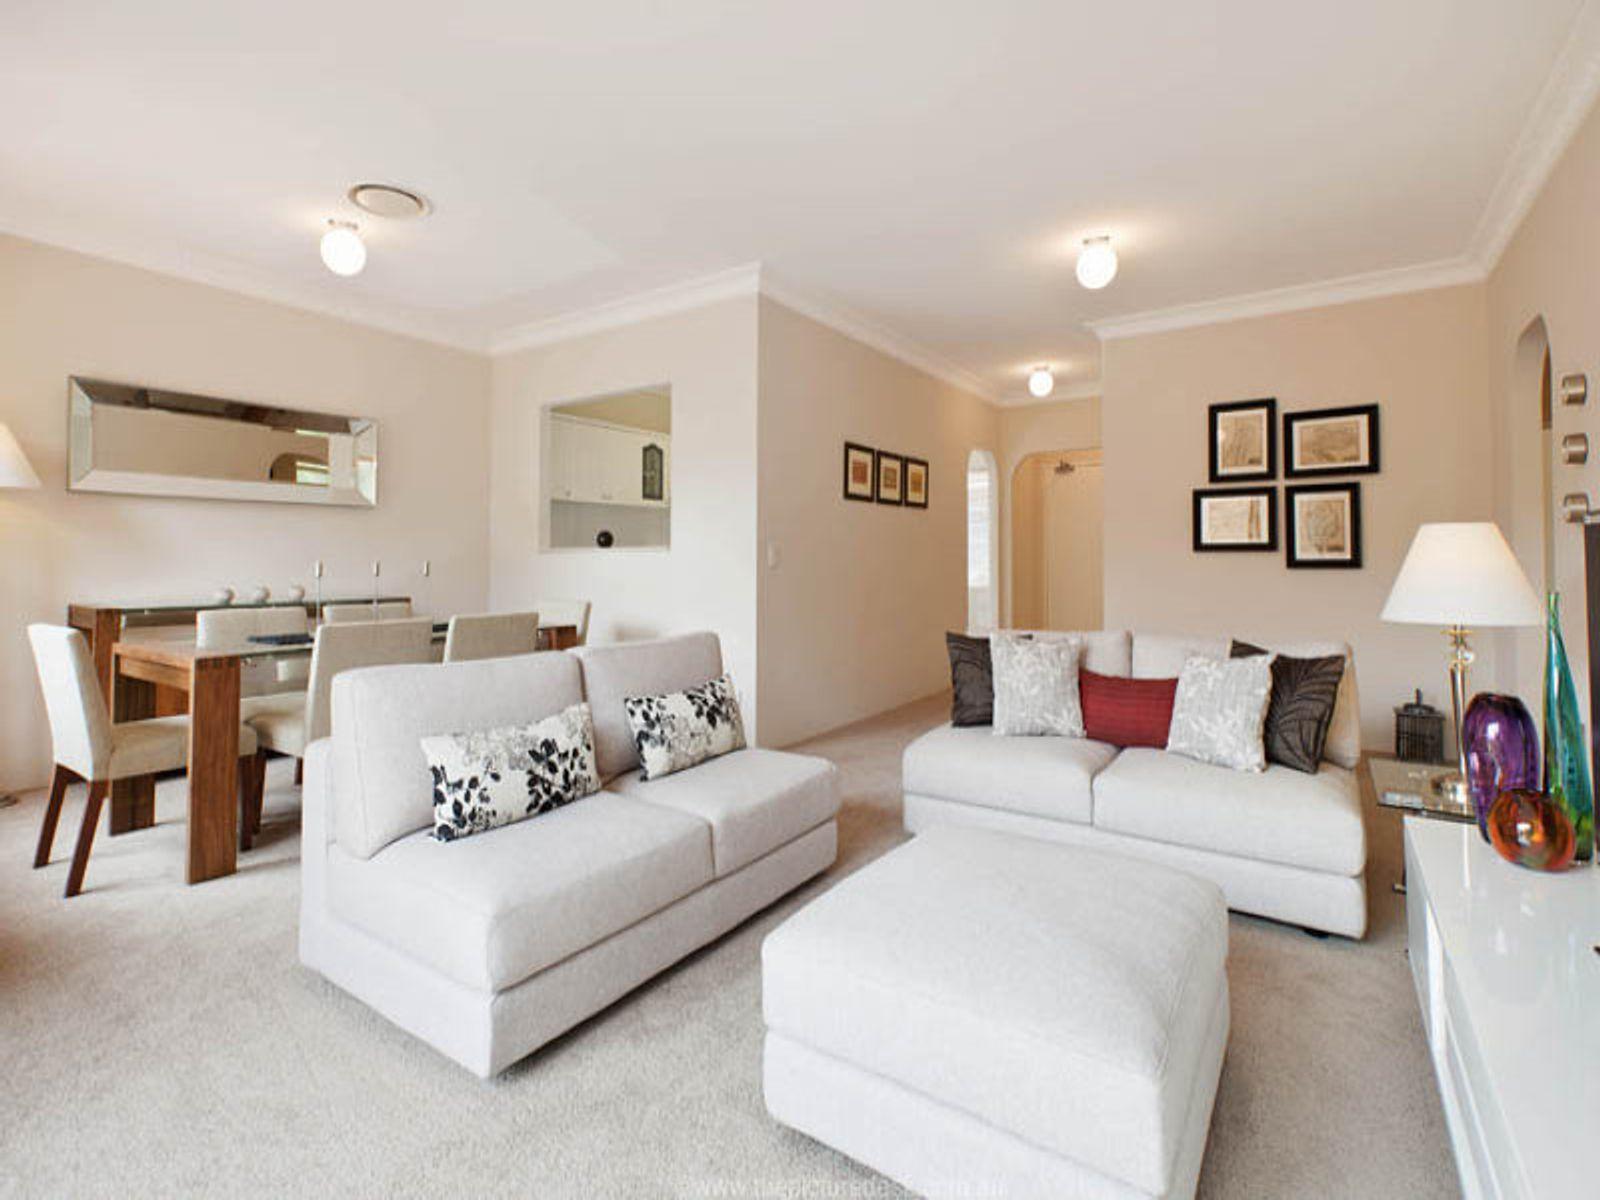 69/181-183 St Johns Avenue, Gordon, NSW 2072